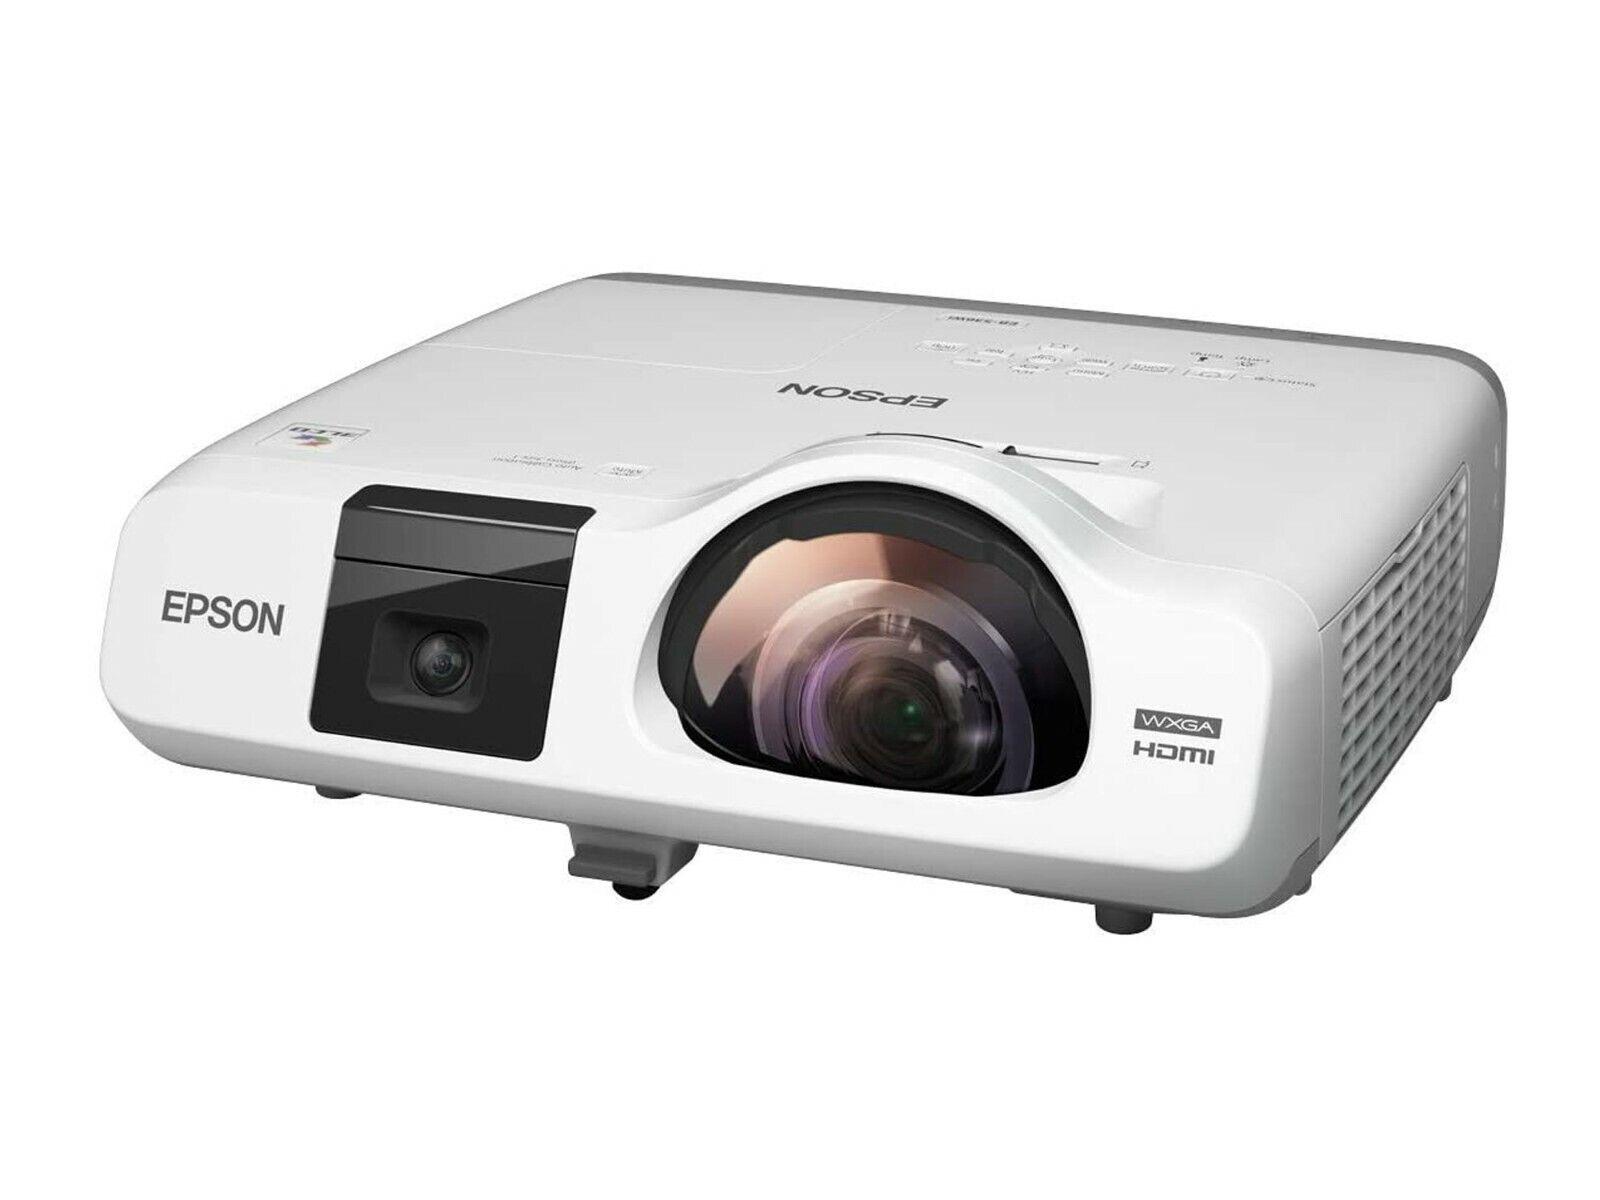 Epson EB-536Wi Interactive Conference Room Projector- HDMI,Home Cinema